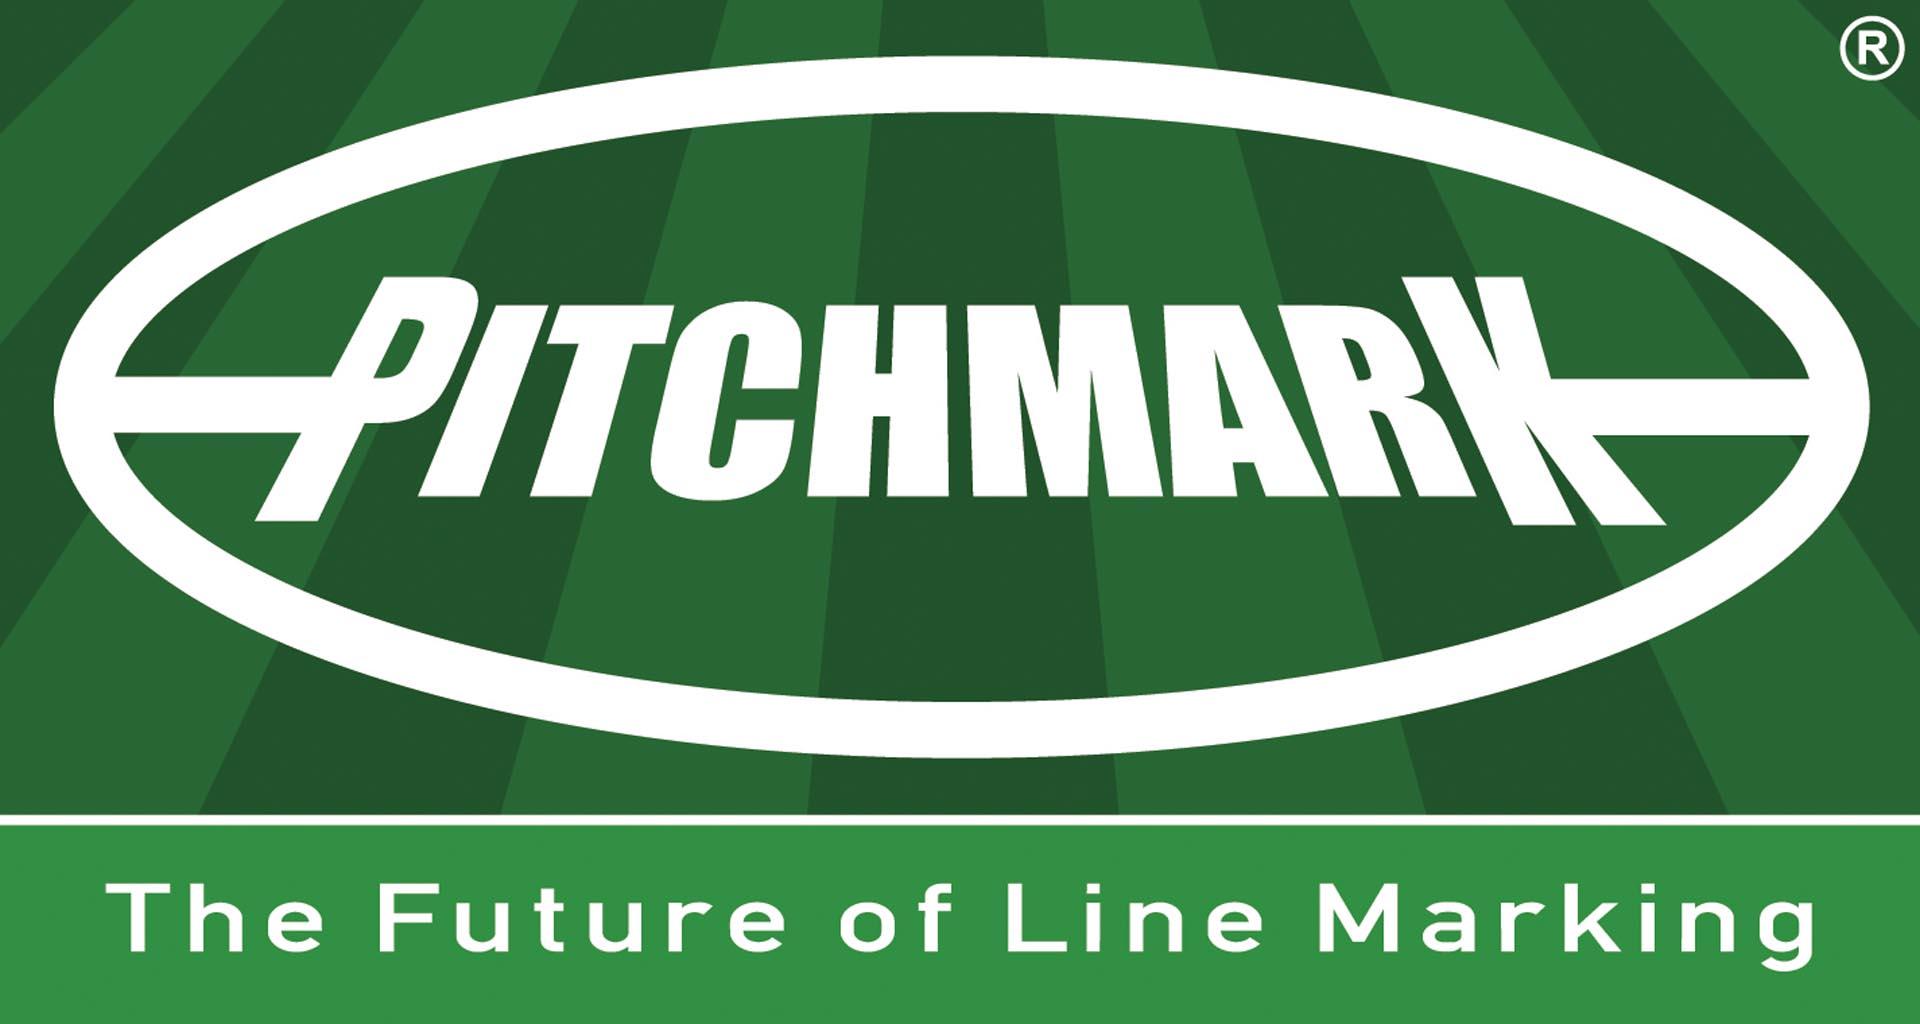 Pitchmark Logo CMYK